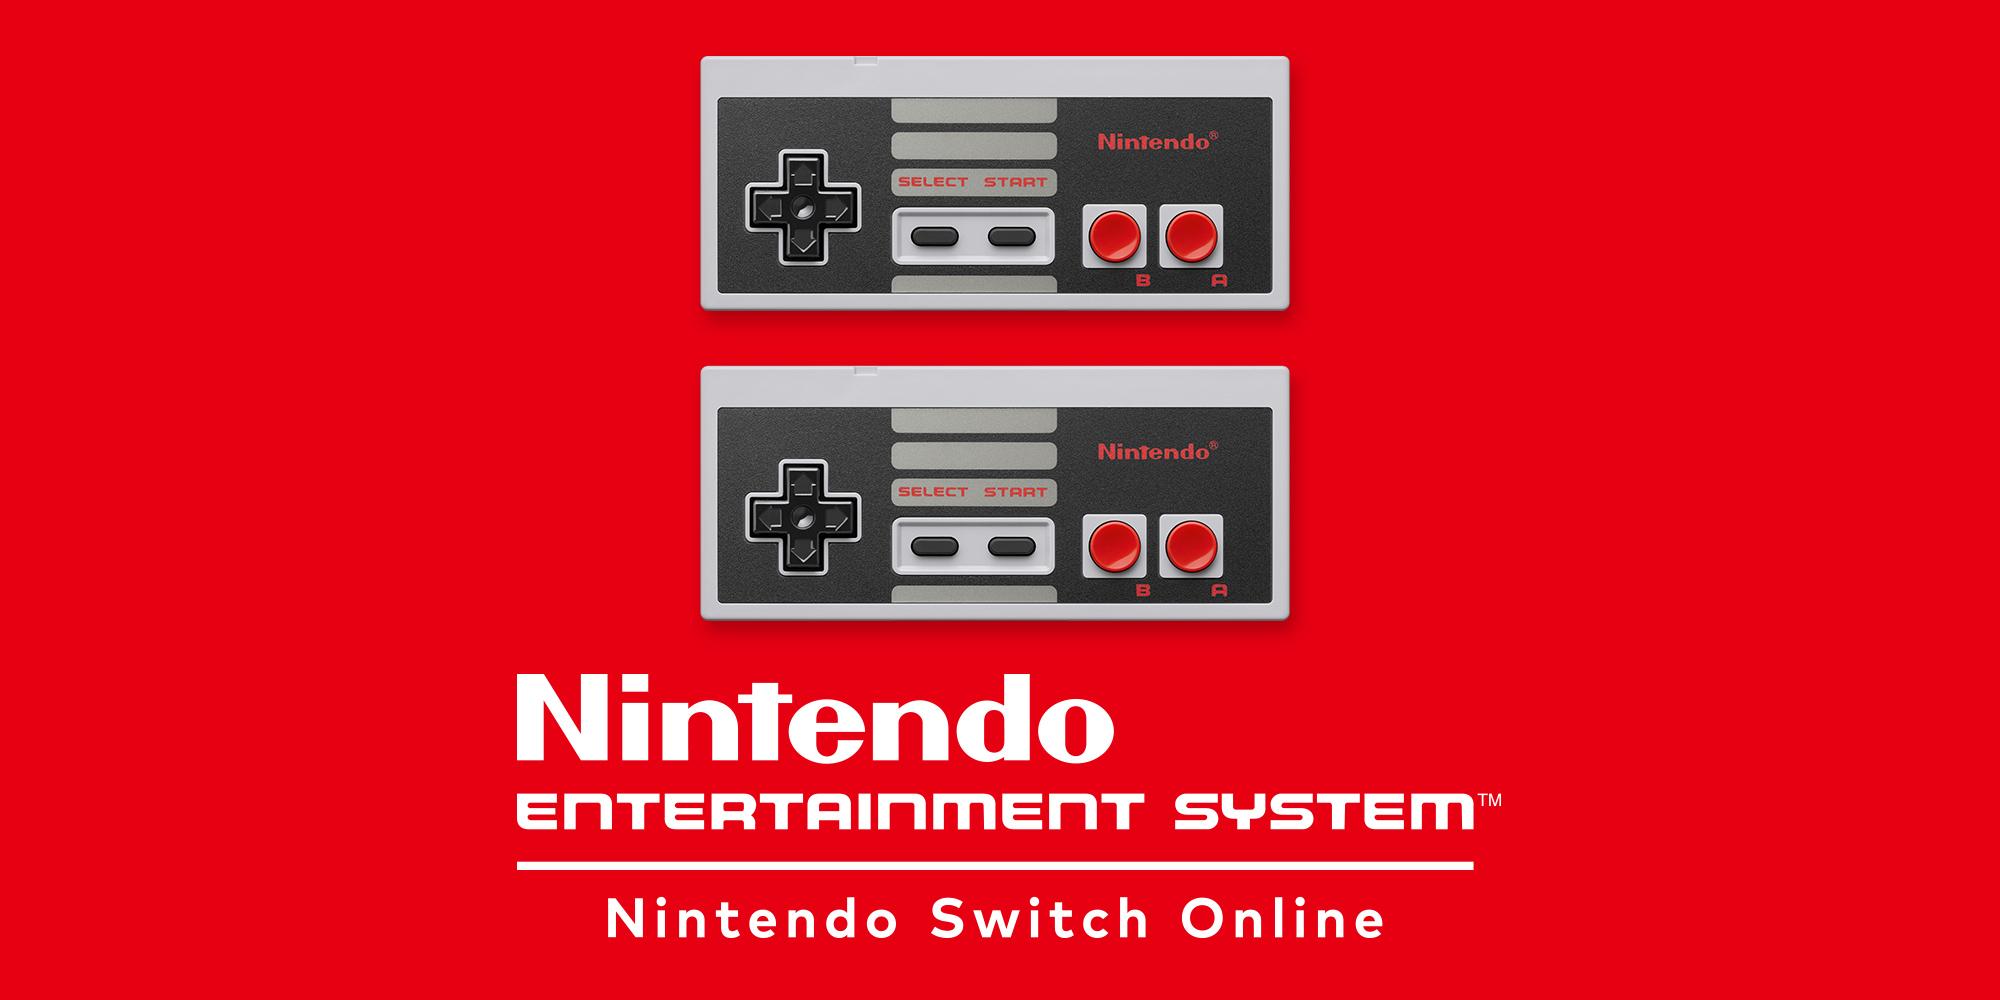 Nintendo Entertainment System – Nintendo Switch Online | Загружаемые  программы Nintendo Switch | Игры | Nintendo